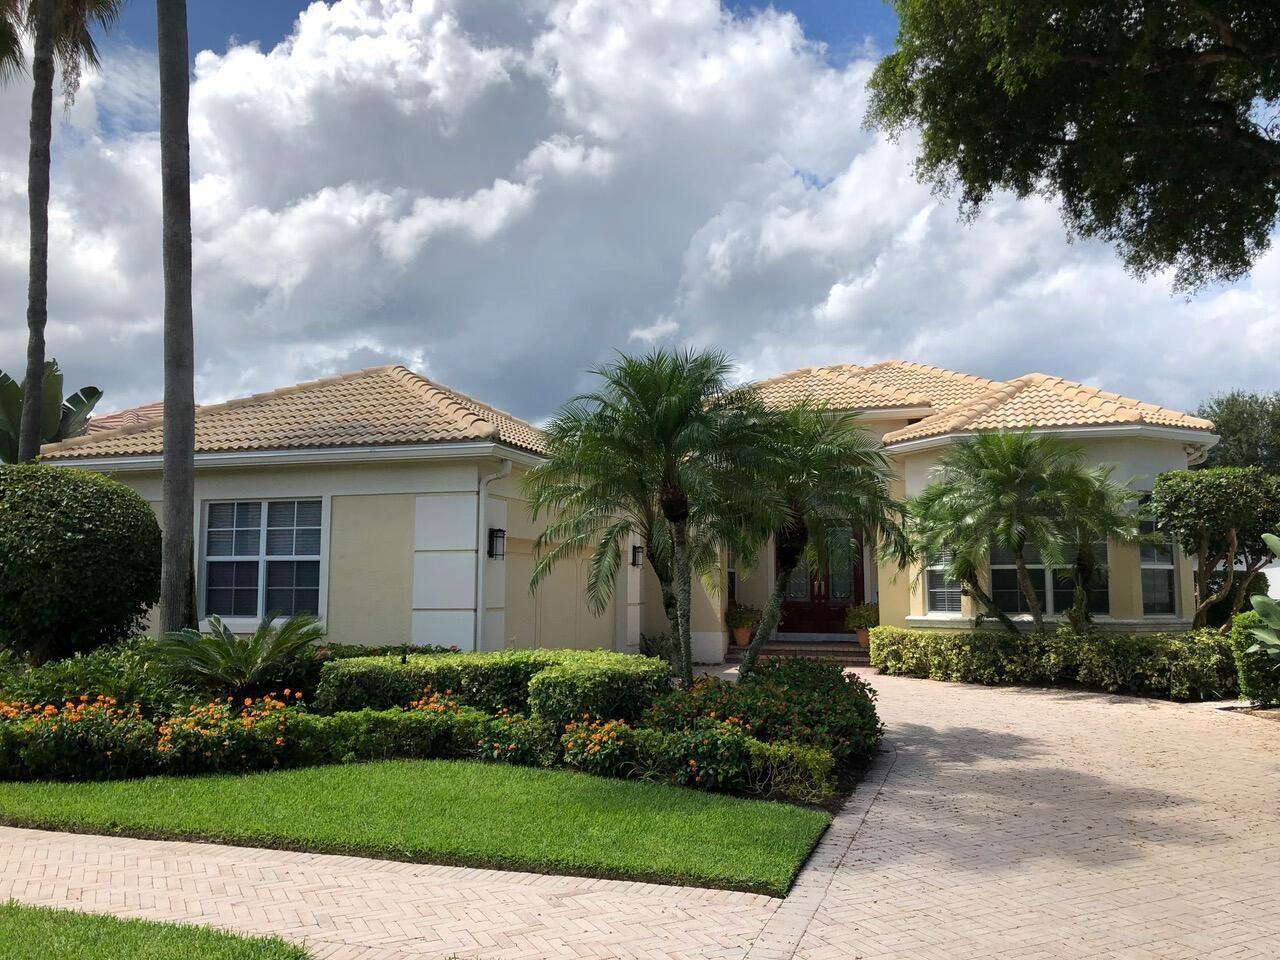 Photo of 119 Banyan Isle Drive, Palm Beach Gardens, FL 33418 (MLS # RX-10746565)